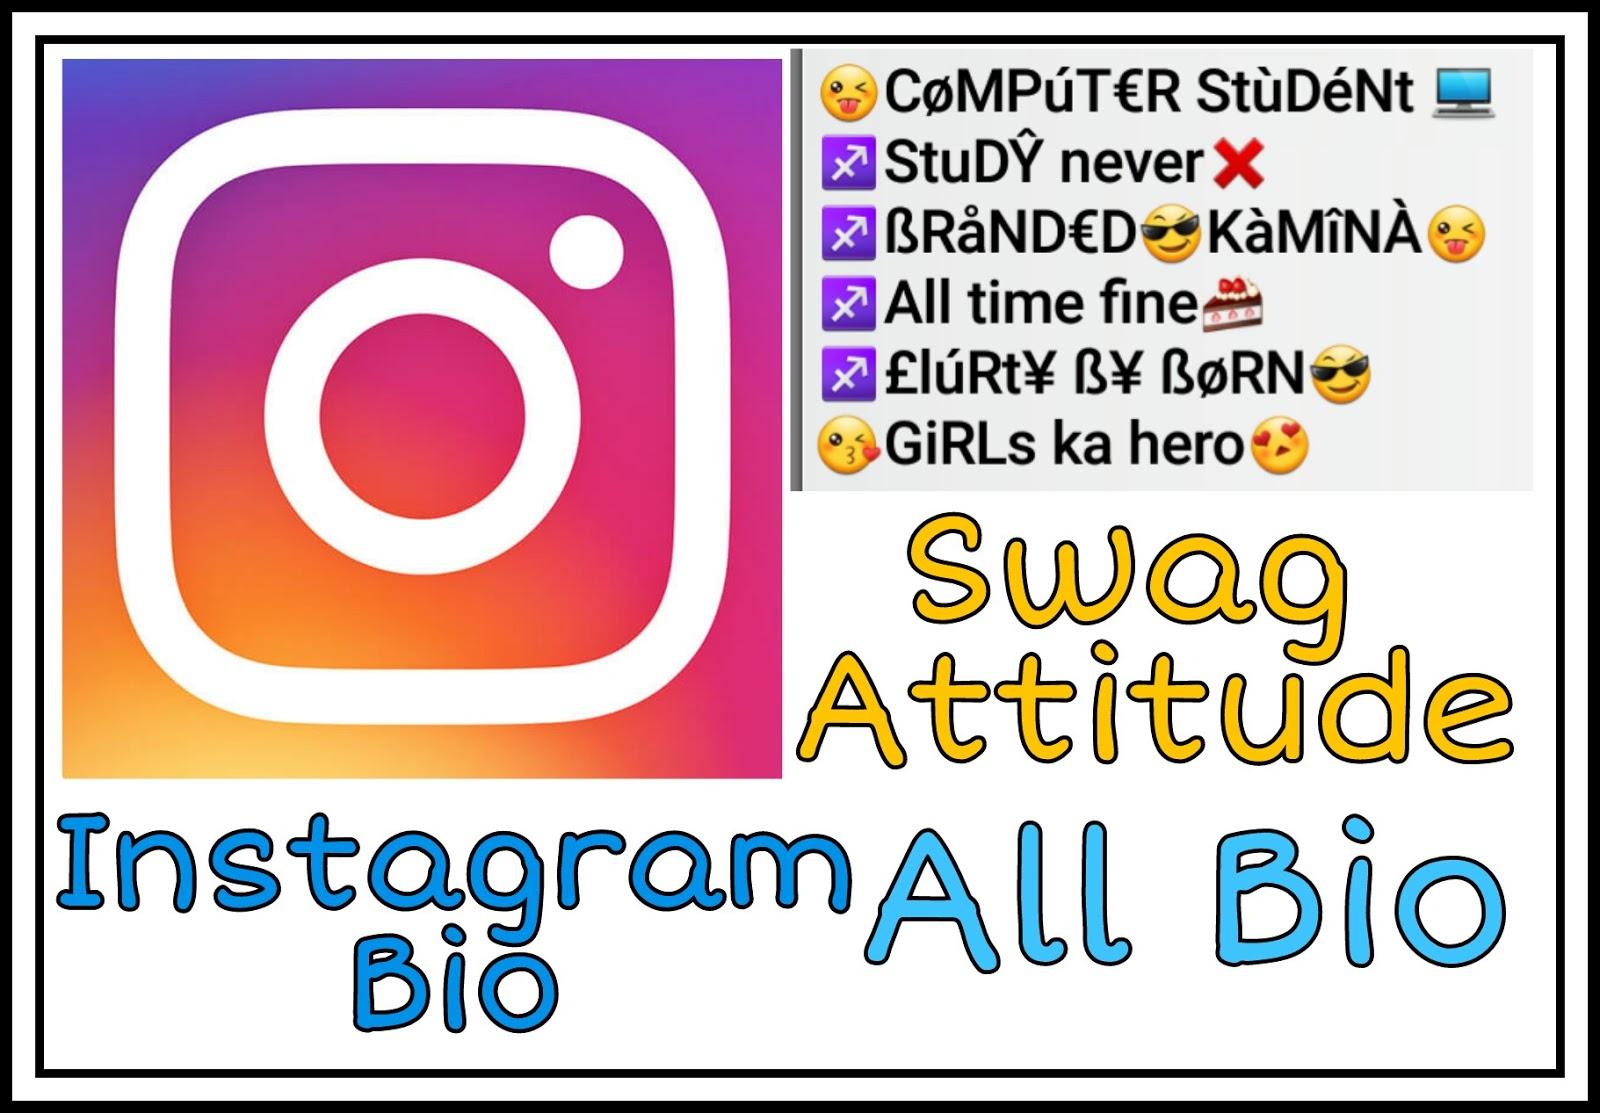 Instagram Bio For Boy Girl Attitudeswagcoolemoji All